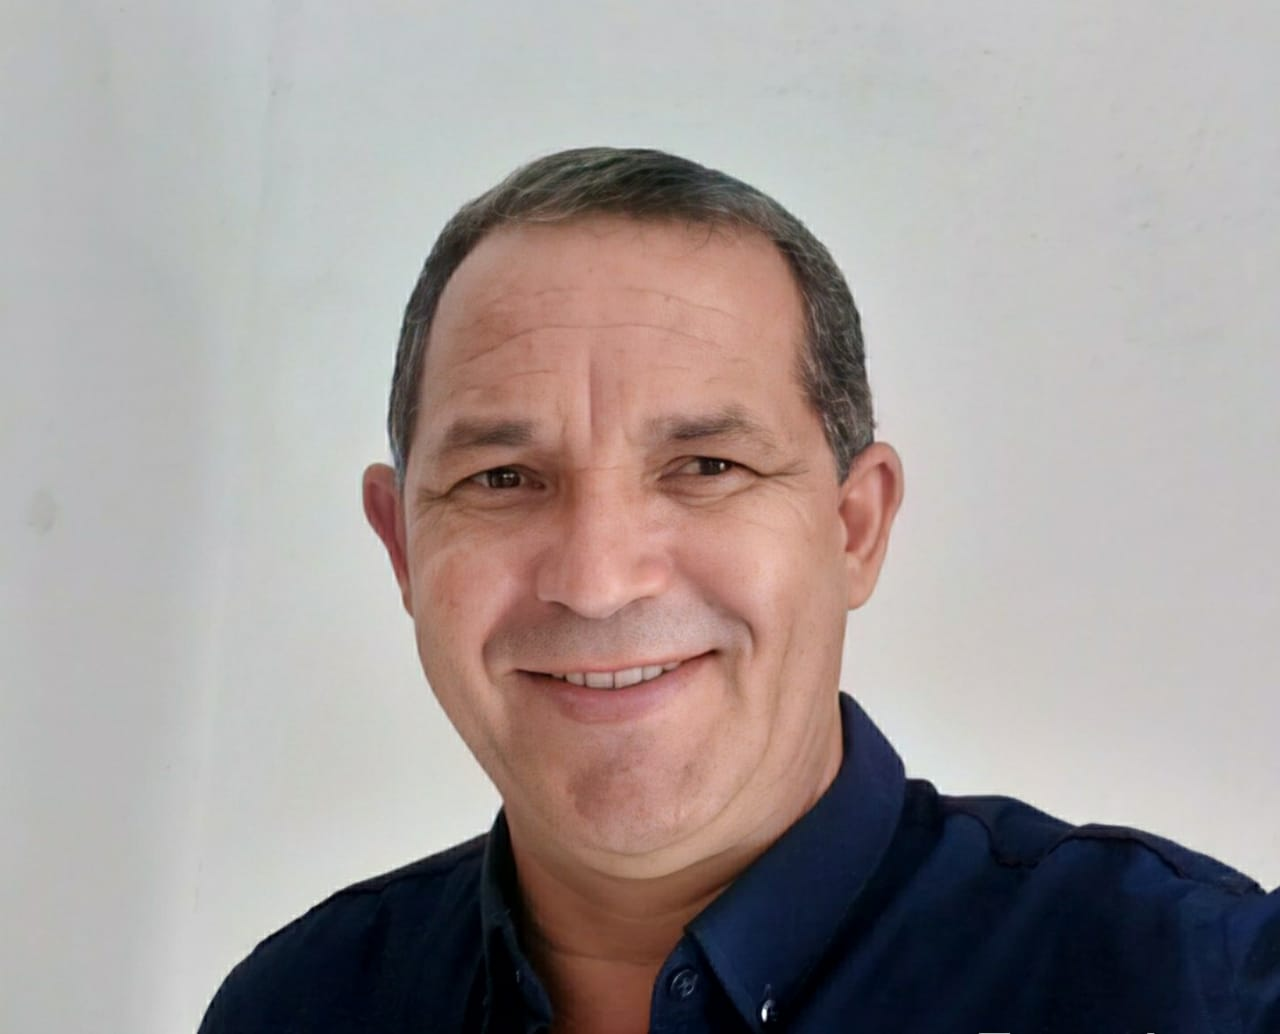 Foto Perfil Antônio Belo